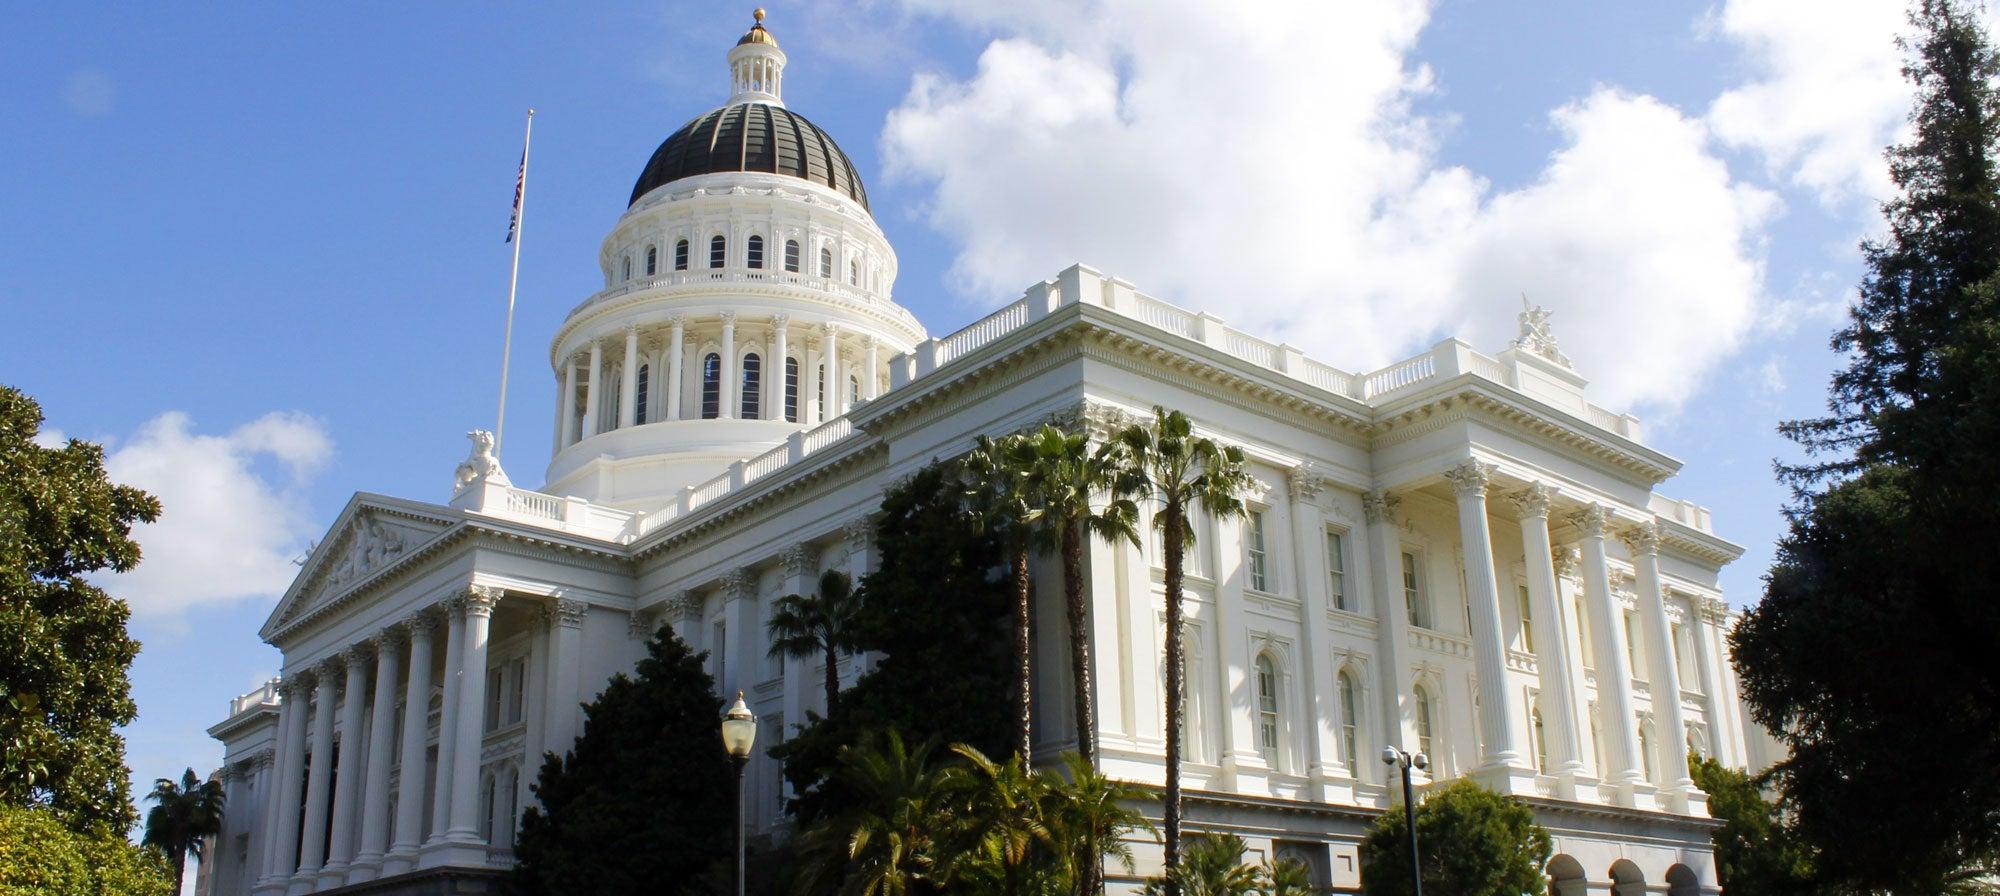 Sacramento California's Capitol building